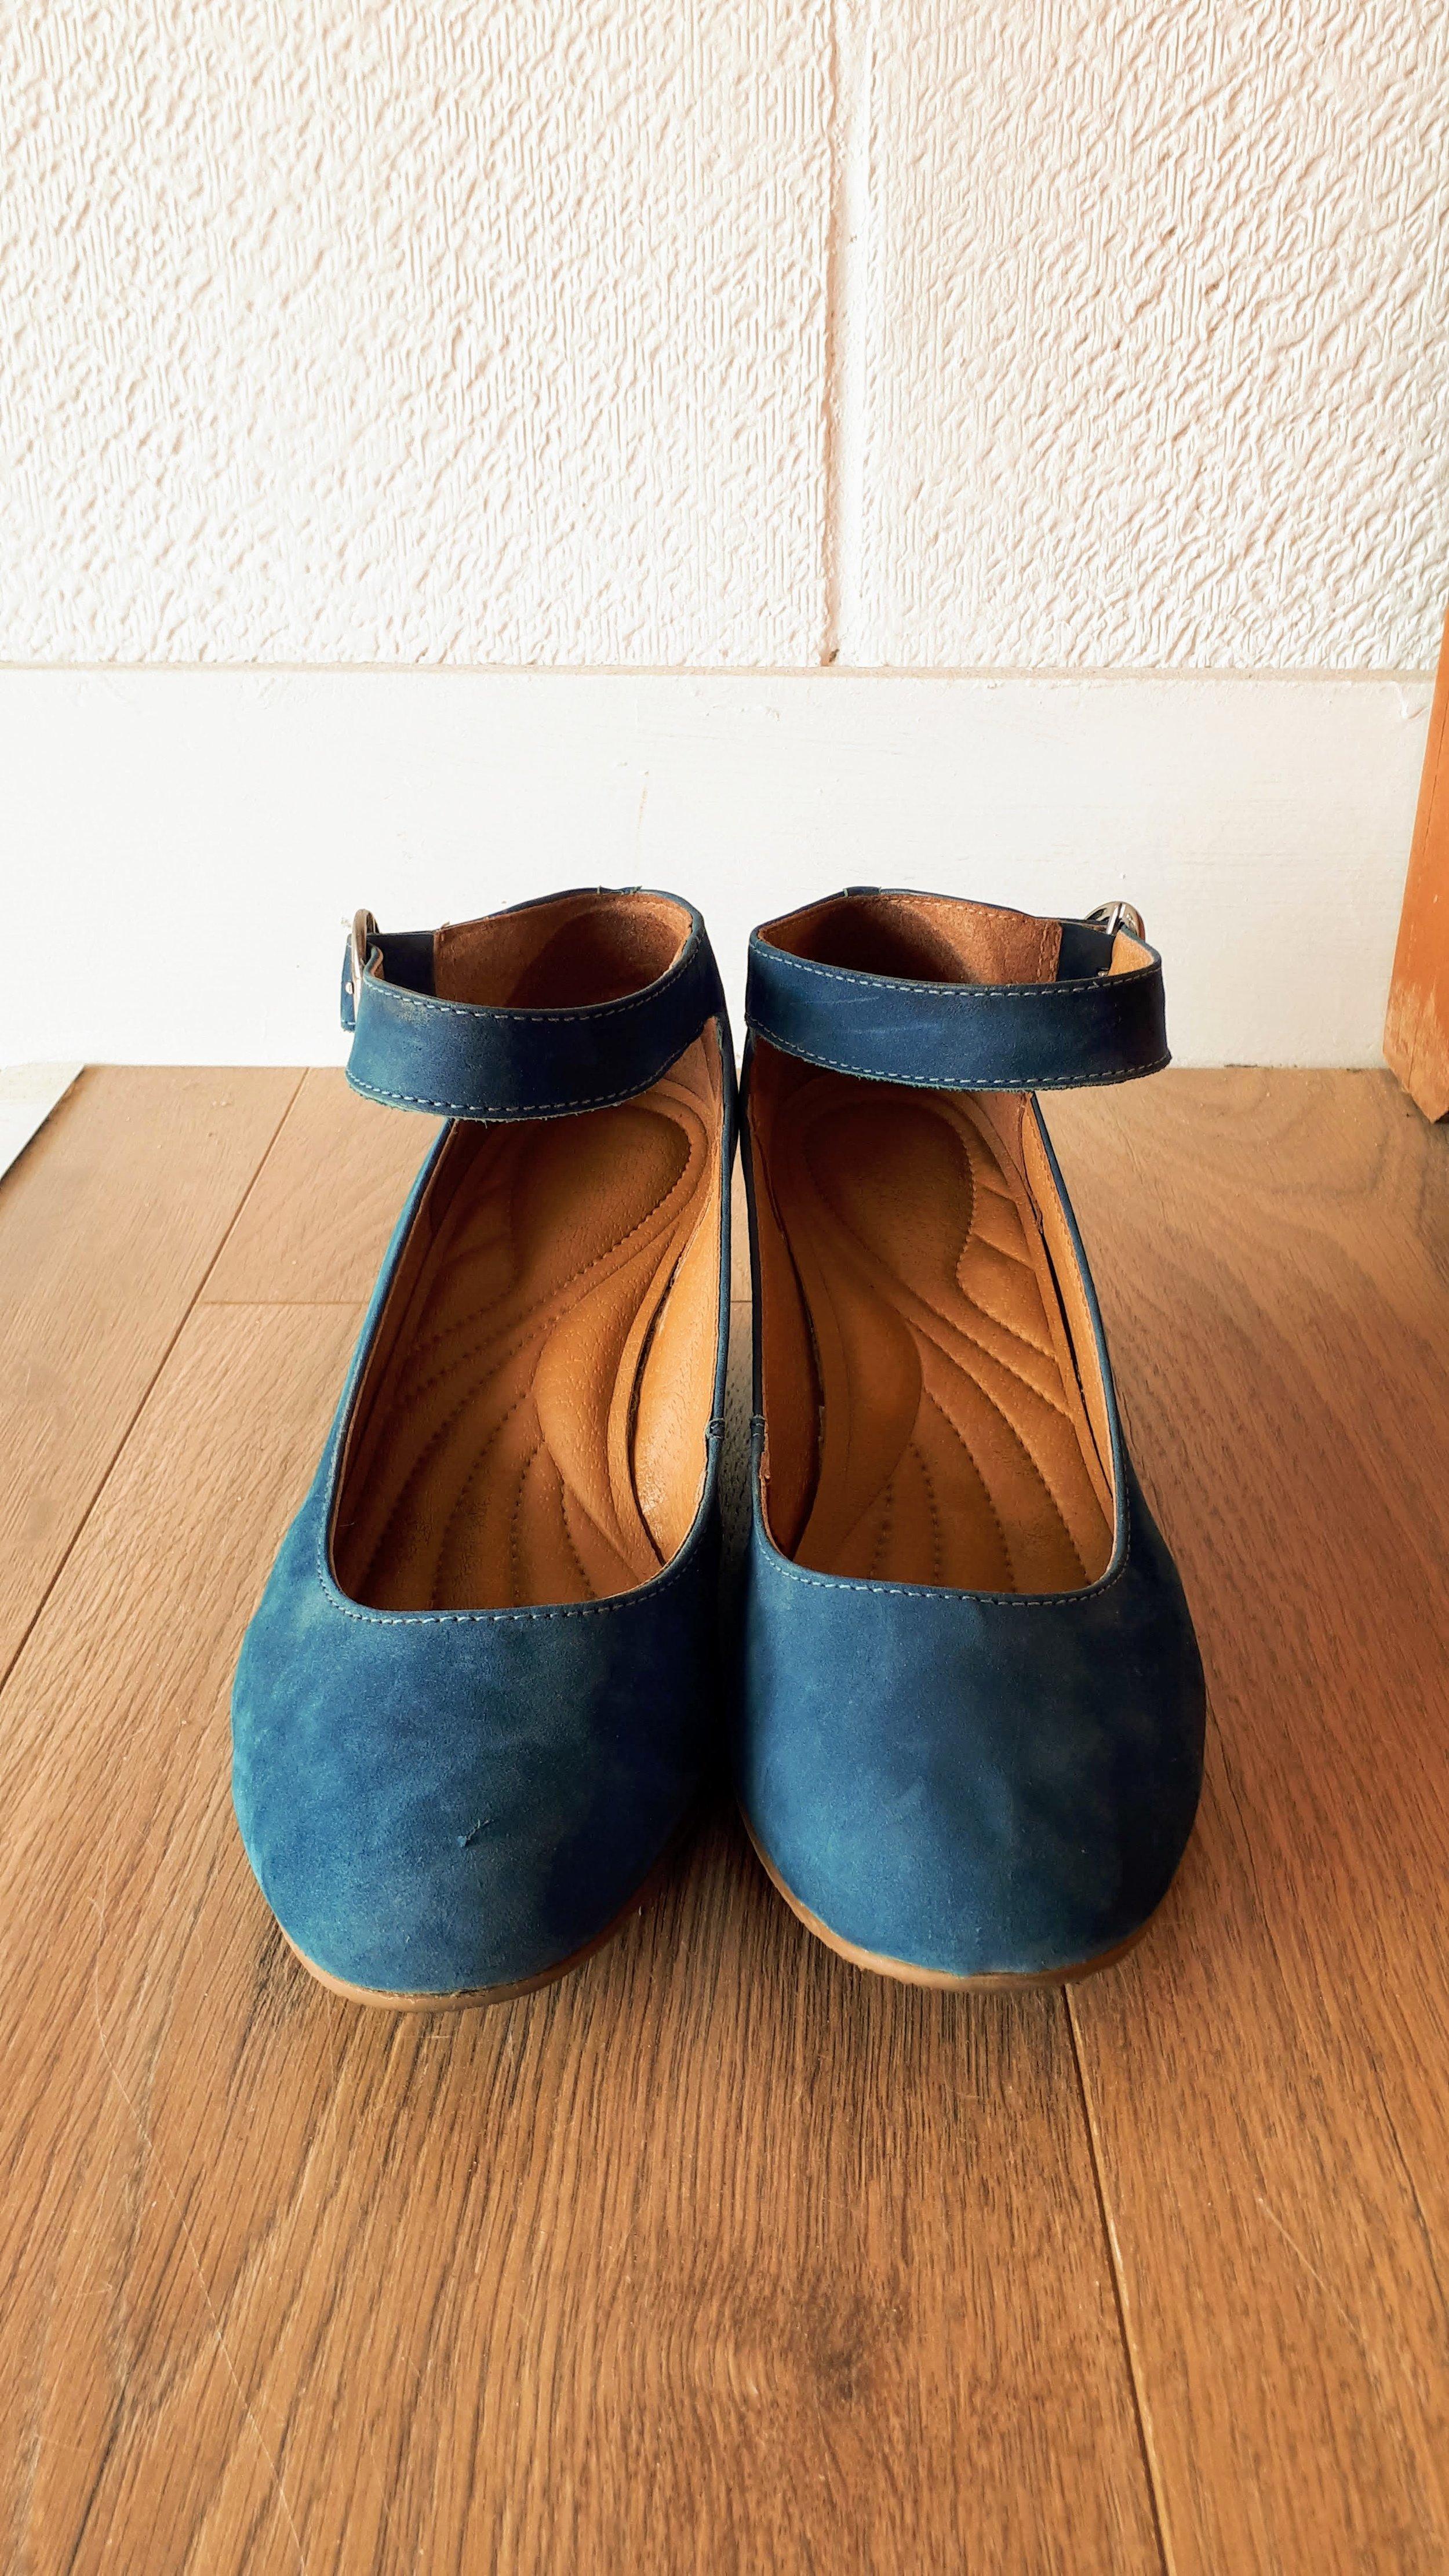 Brazil shoes; Size 7.5, $36